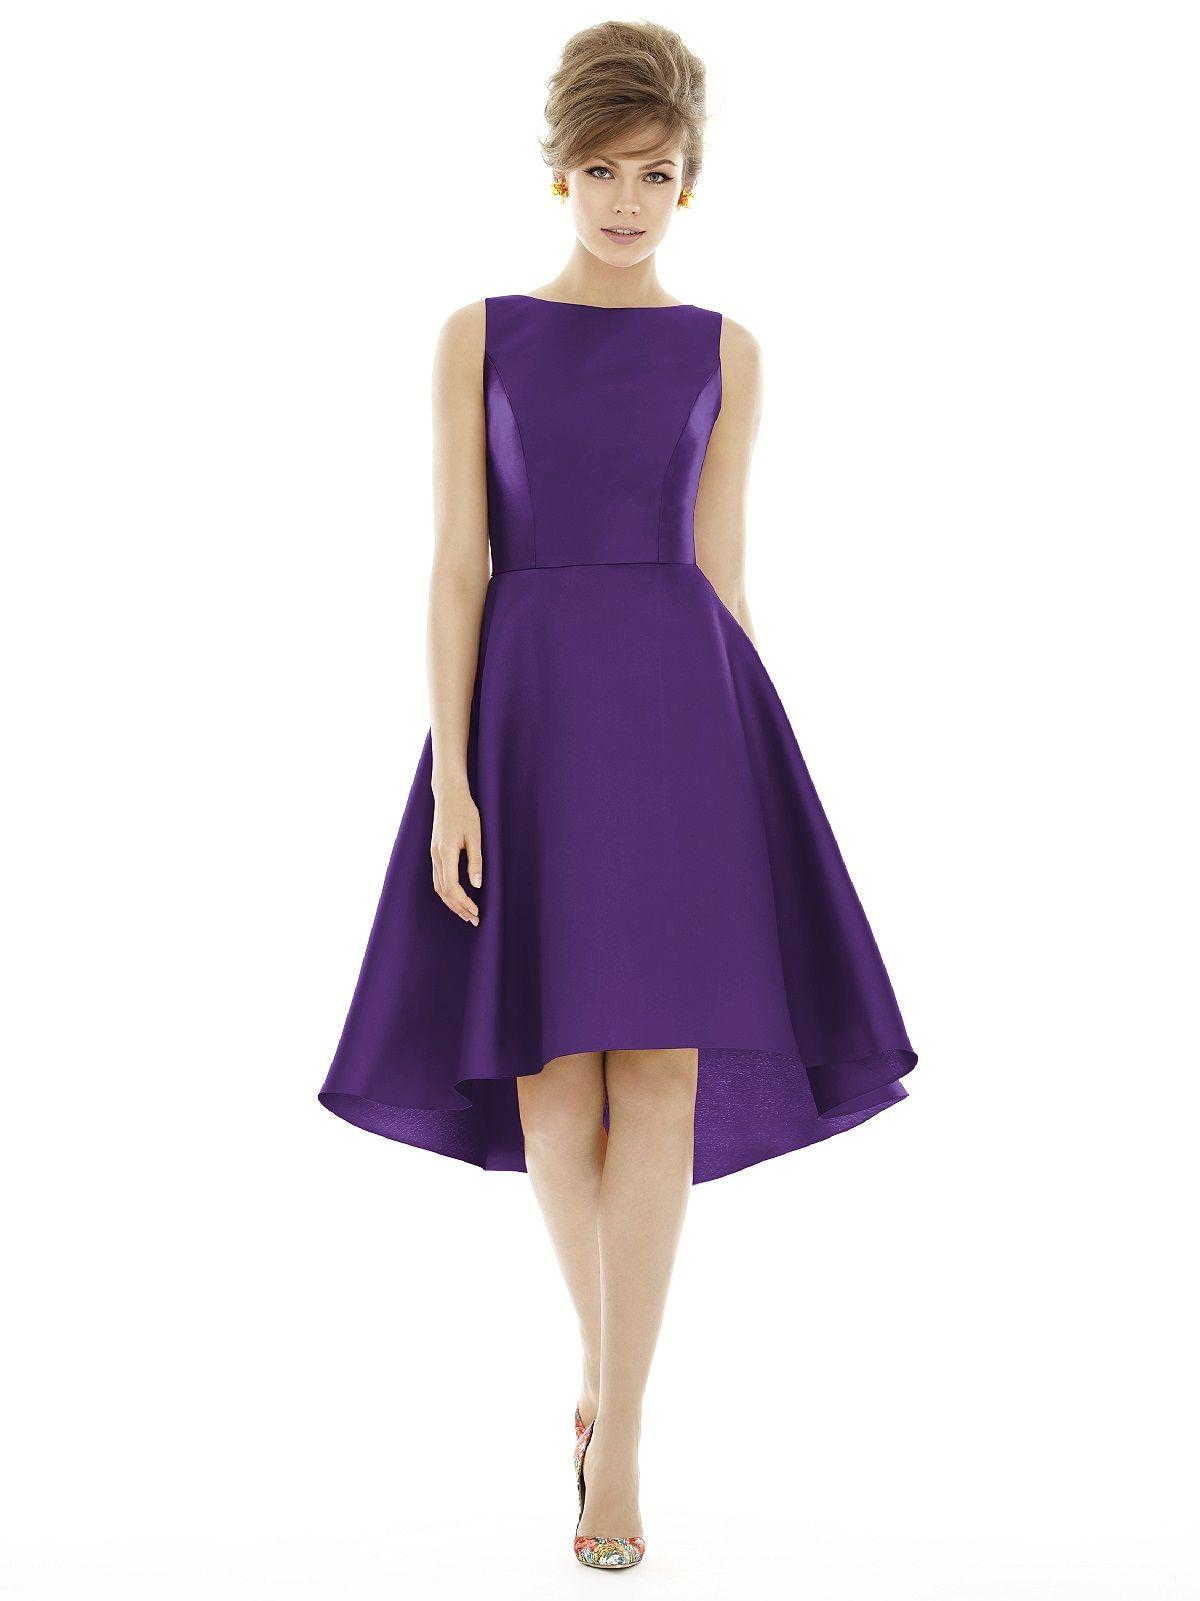 Purple bridesmaid dress with no sleeves future wedding uc